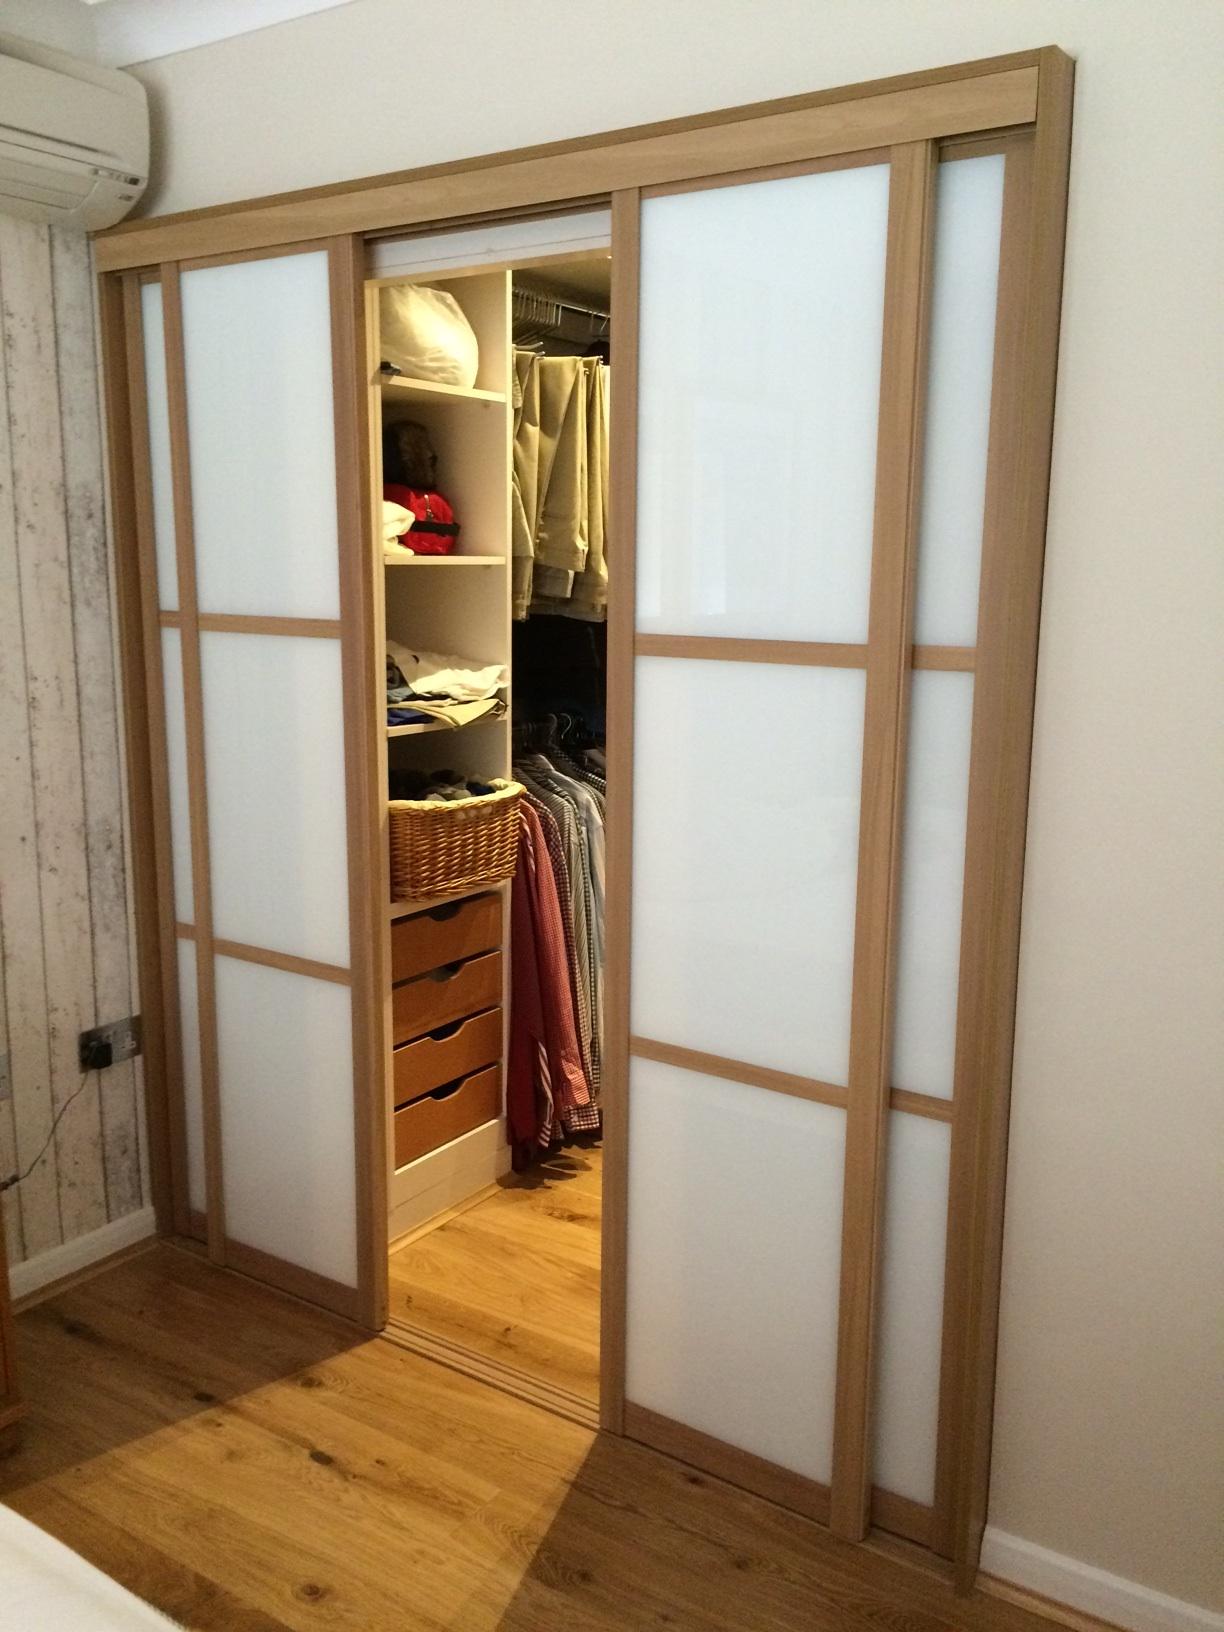 Sliding Wardrobe Doors for Walk-In